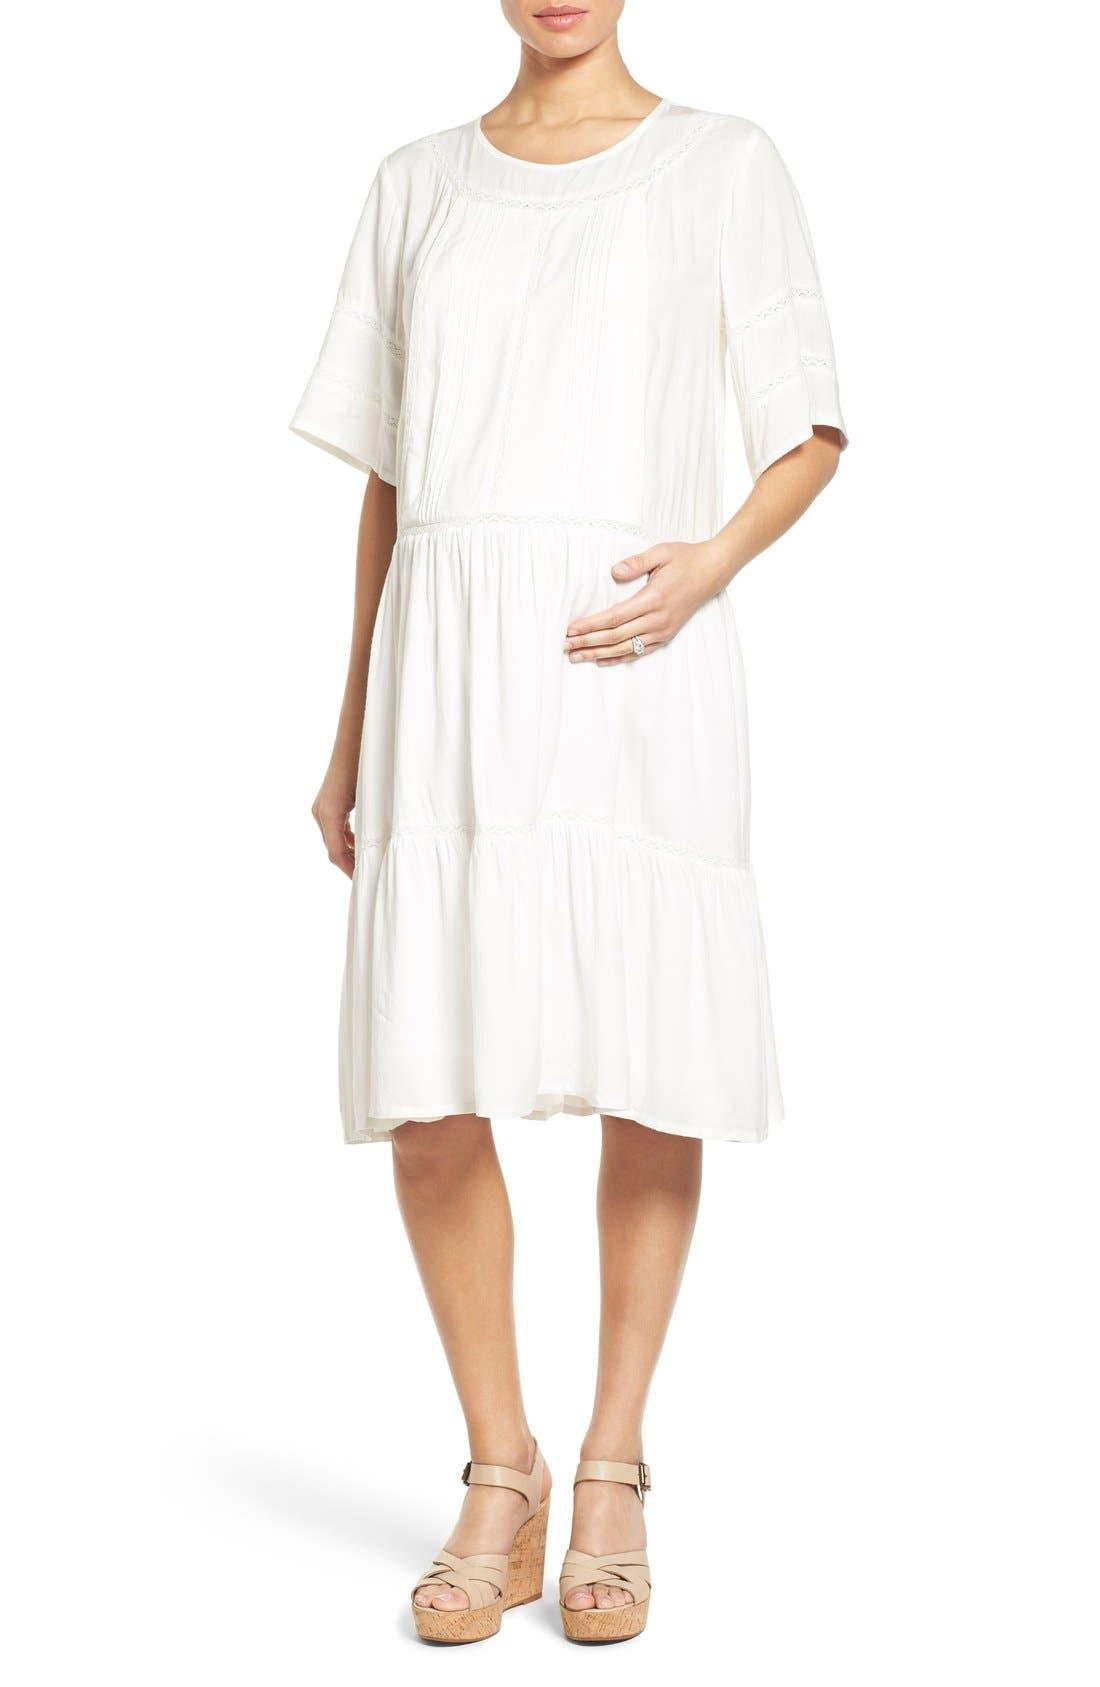 'Wild at Heart' Maternity/Nursing Midi Dress,                         Main,                         color, Cream